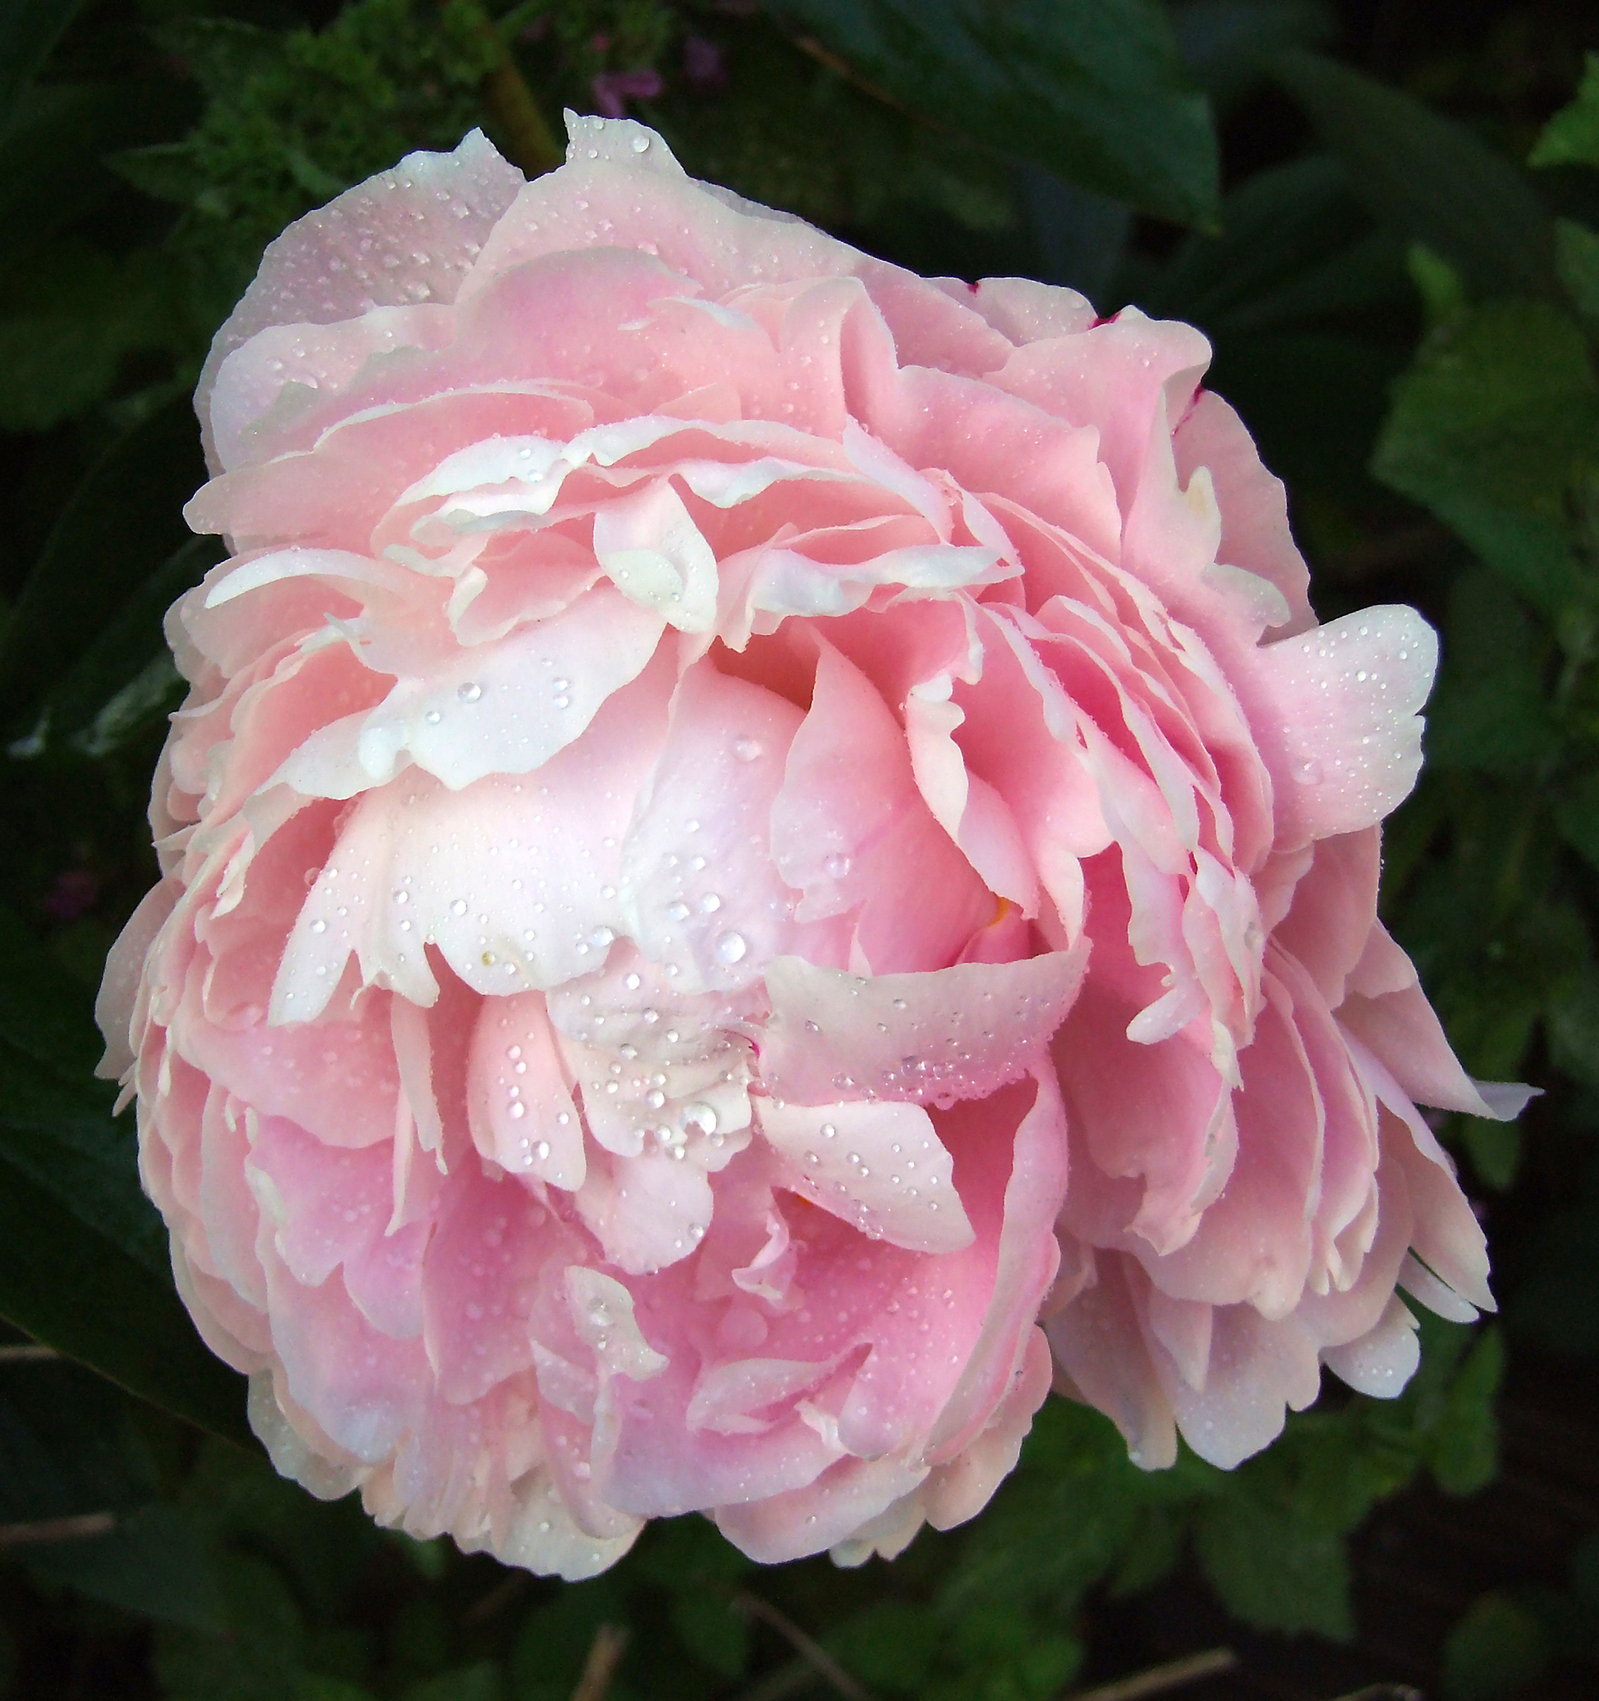 Practical advice for silk flower arranging flower pressflower press how to arrange silk flowers mightylinksfo